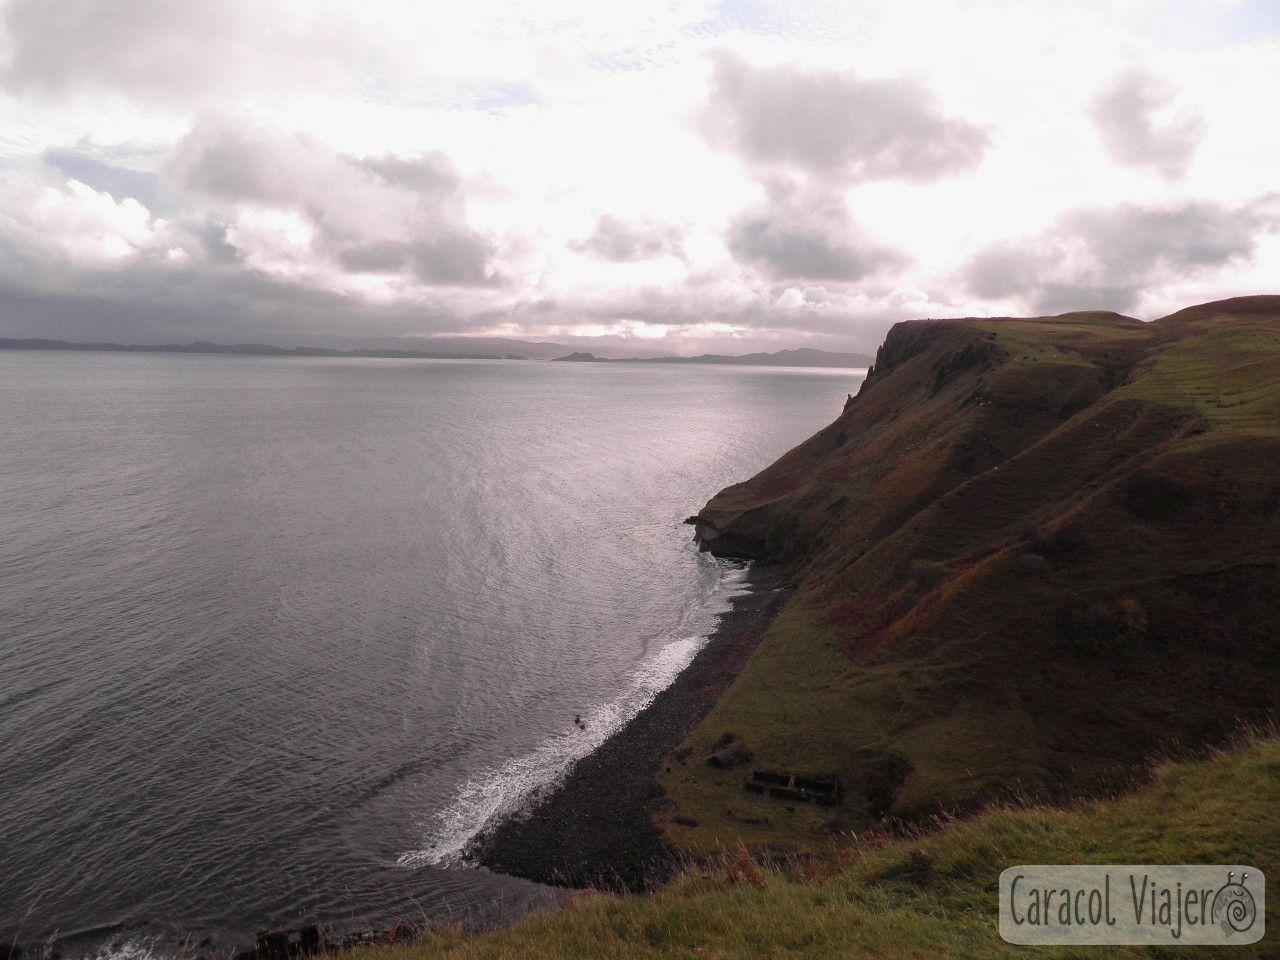 Kilt Rock vistas, Escocia. Acantilado